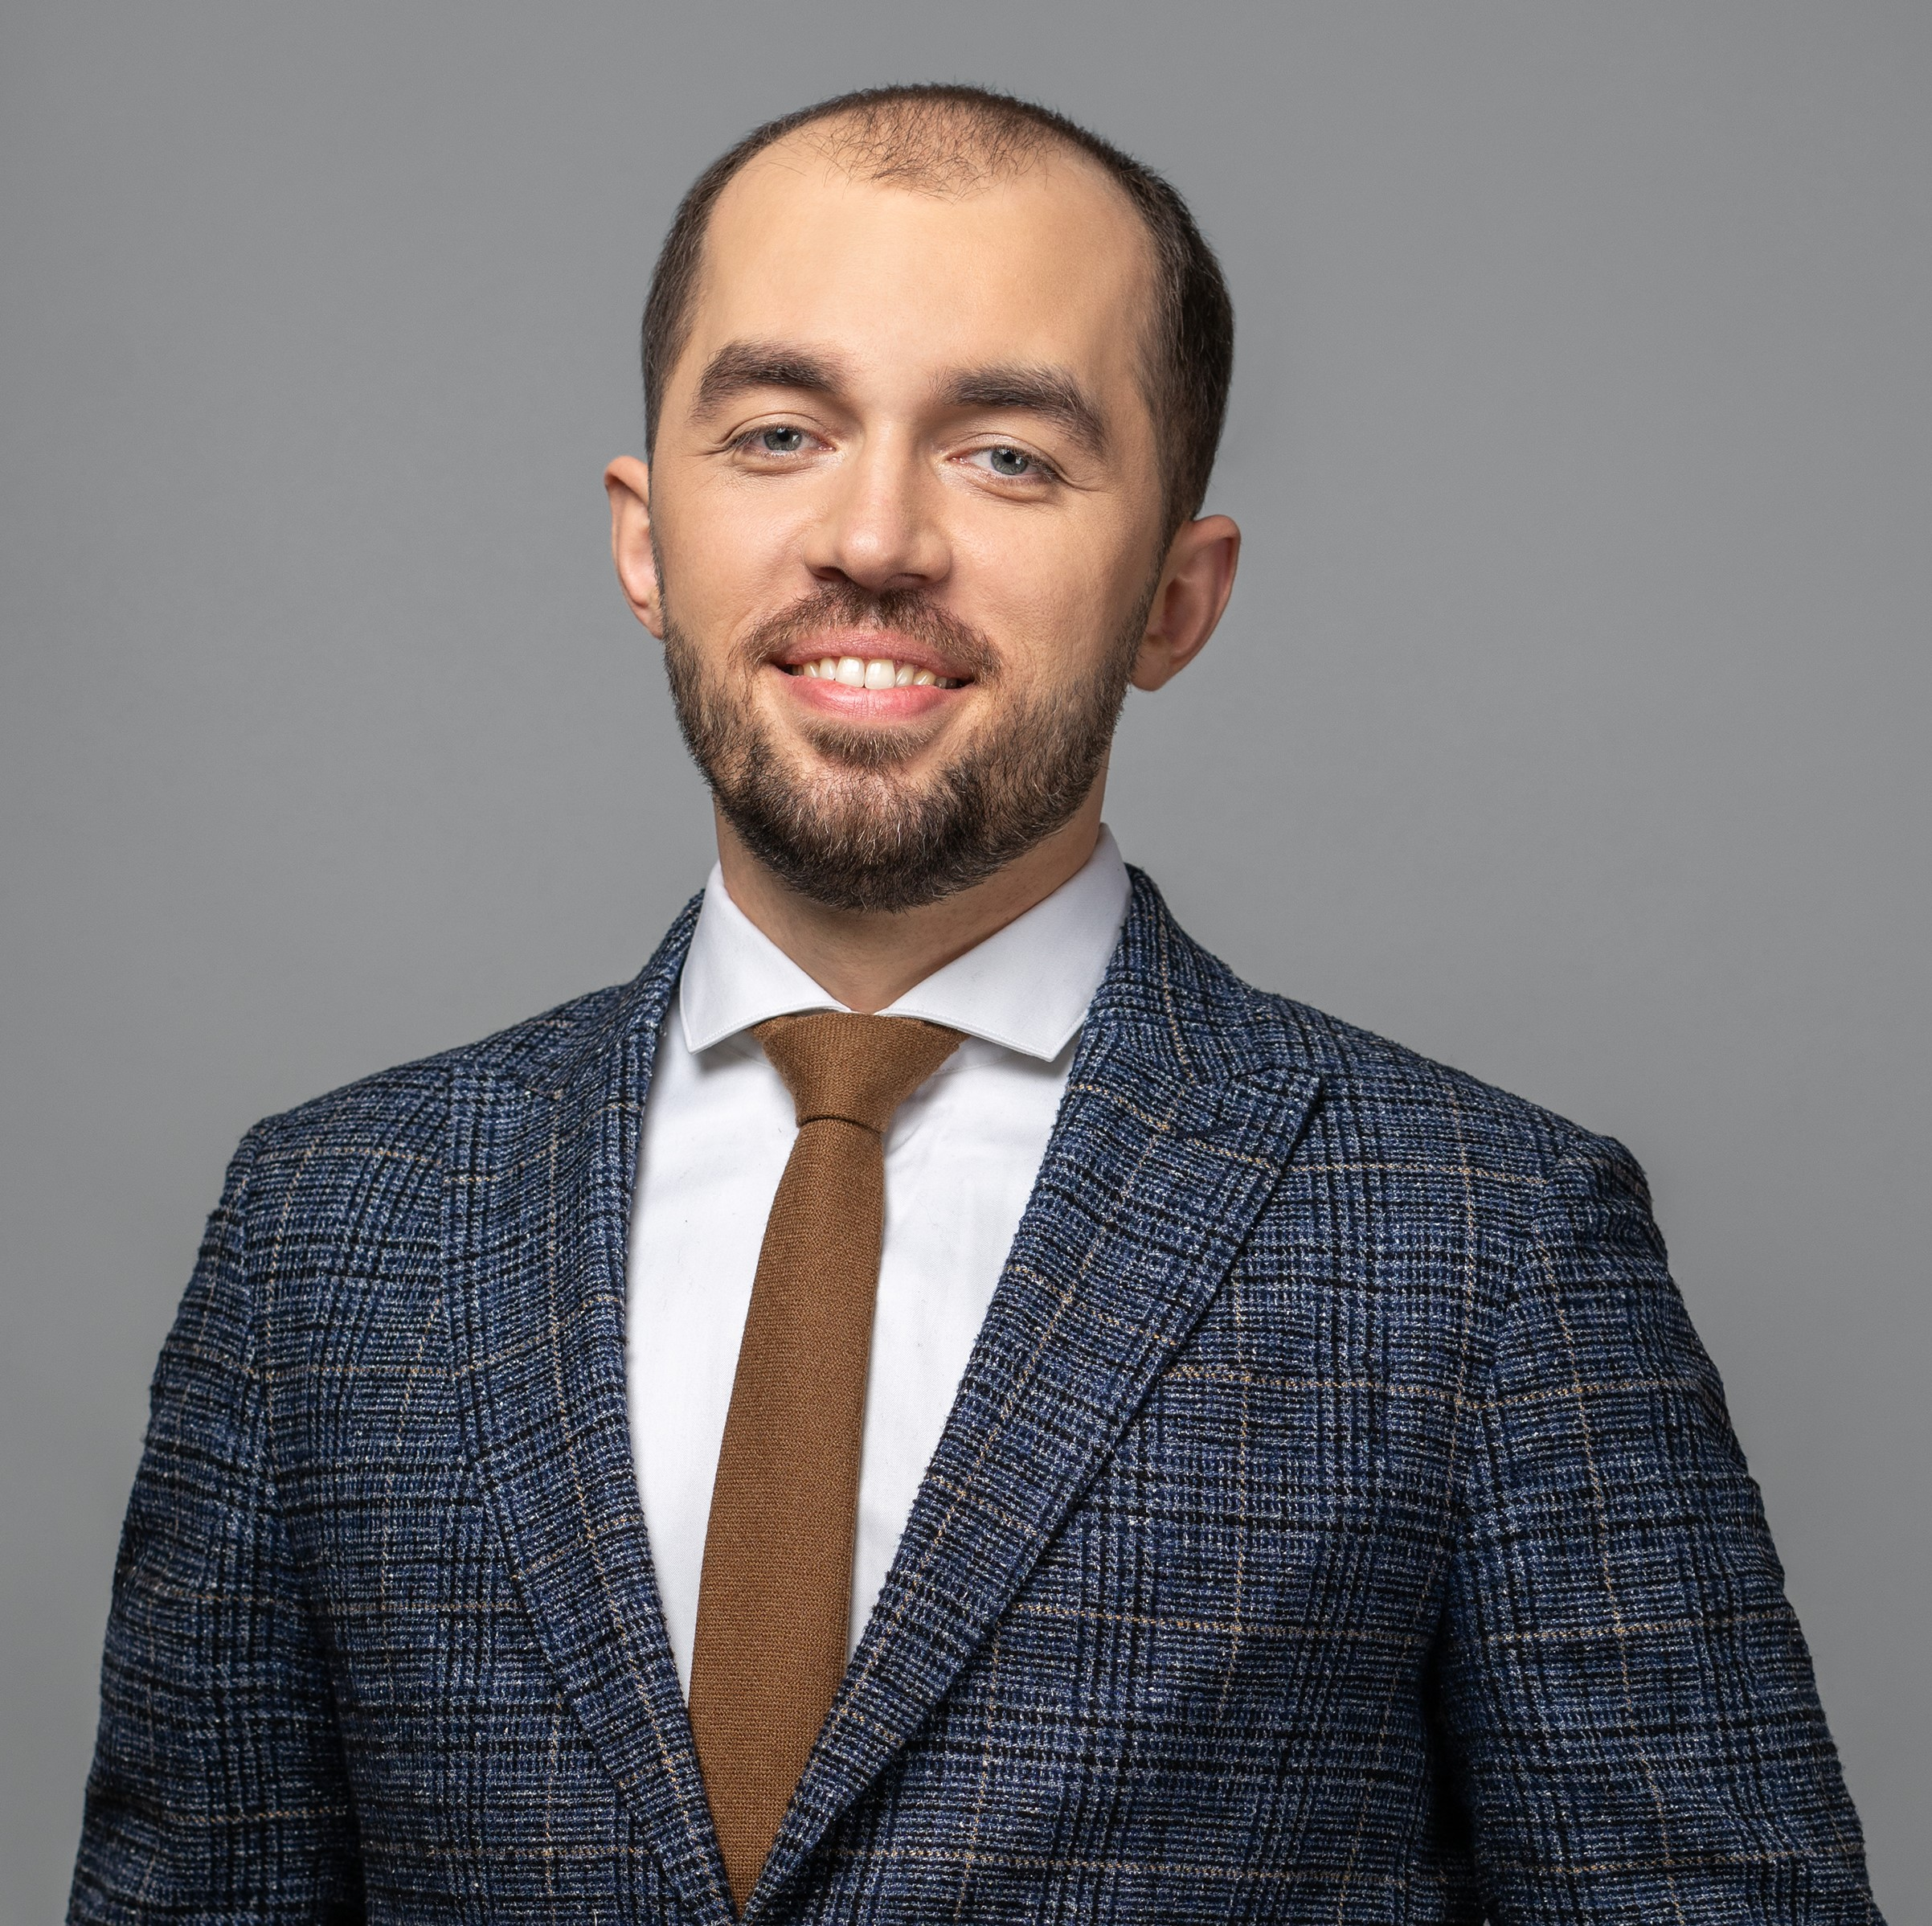 Roman Tychkivskyy